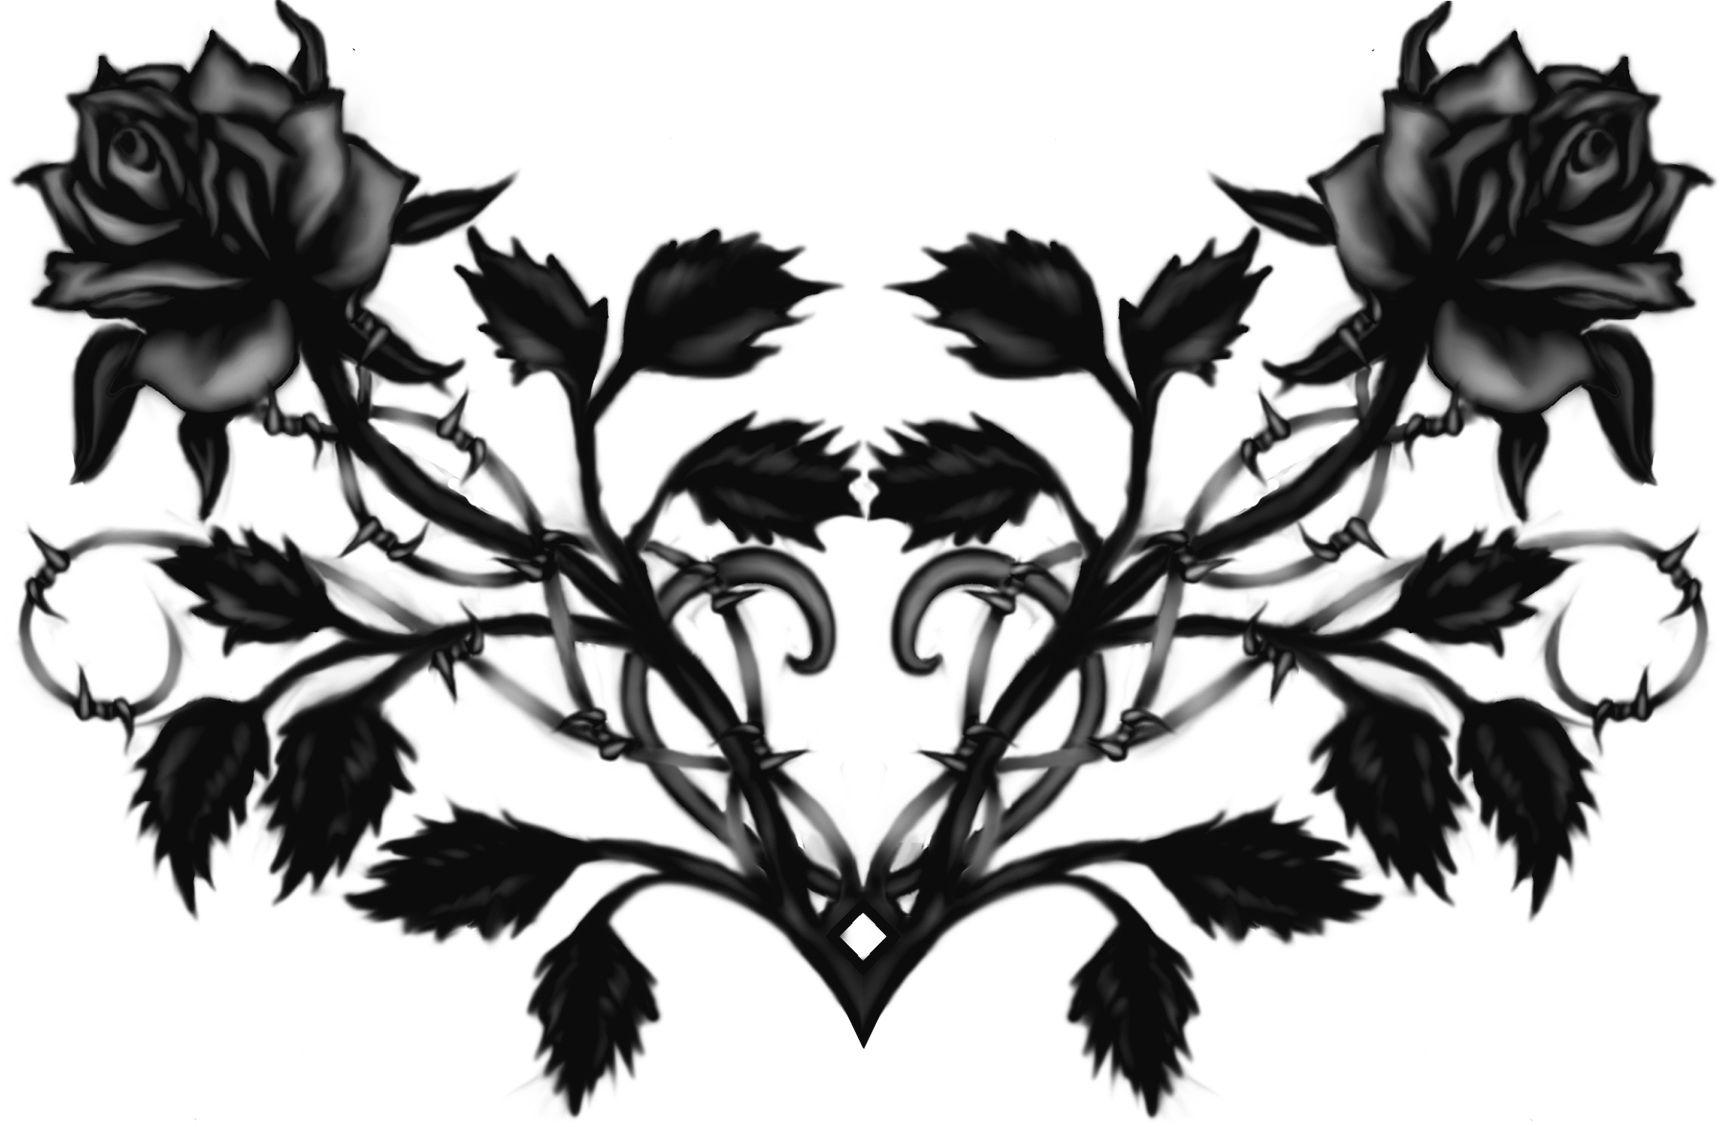 Gothic Black Rose Tattoo